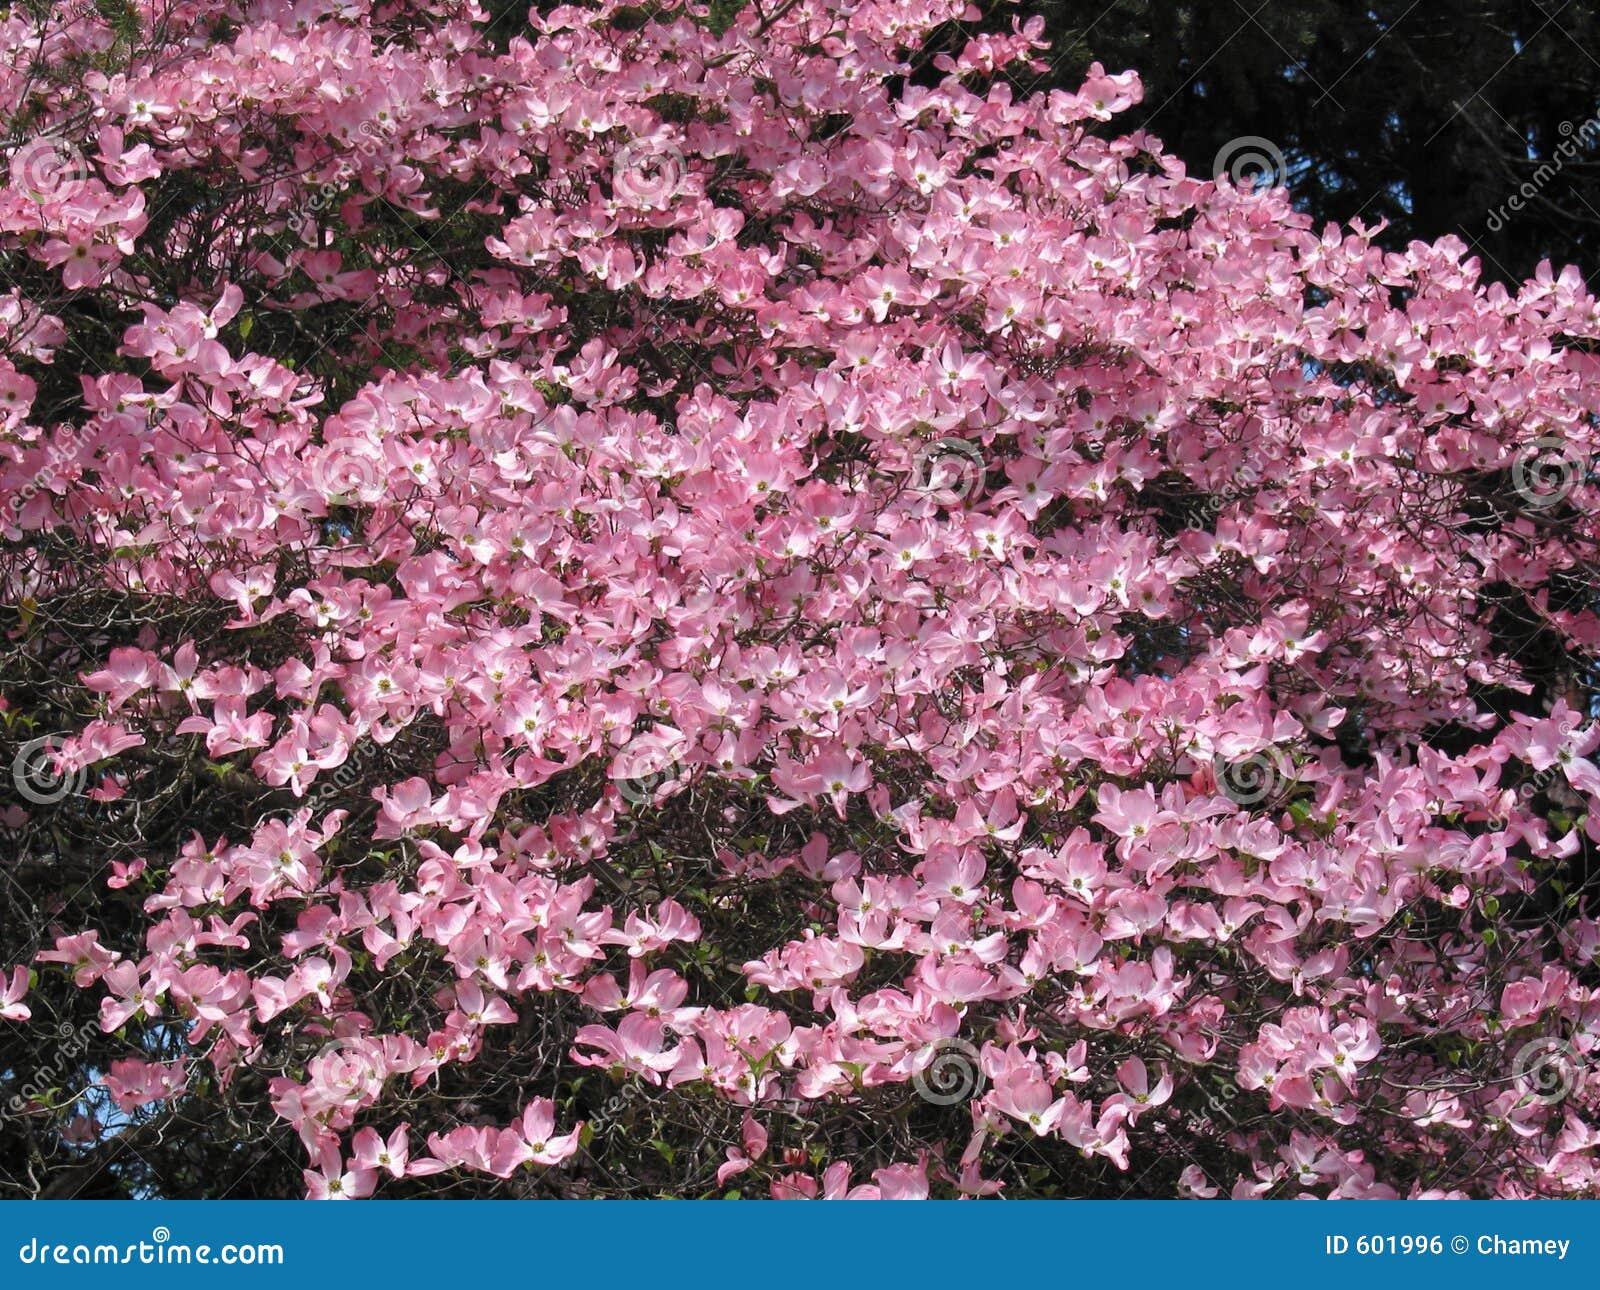 Pink Dogwood Tree Stock Photo Image Of Gardening Mass 601996